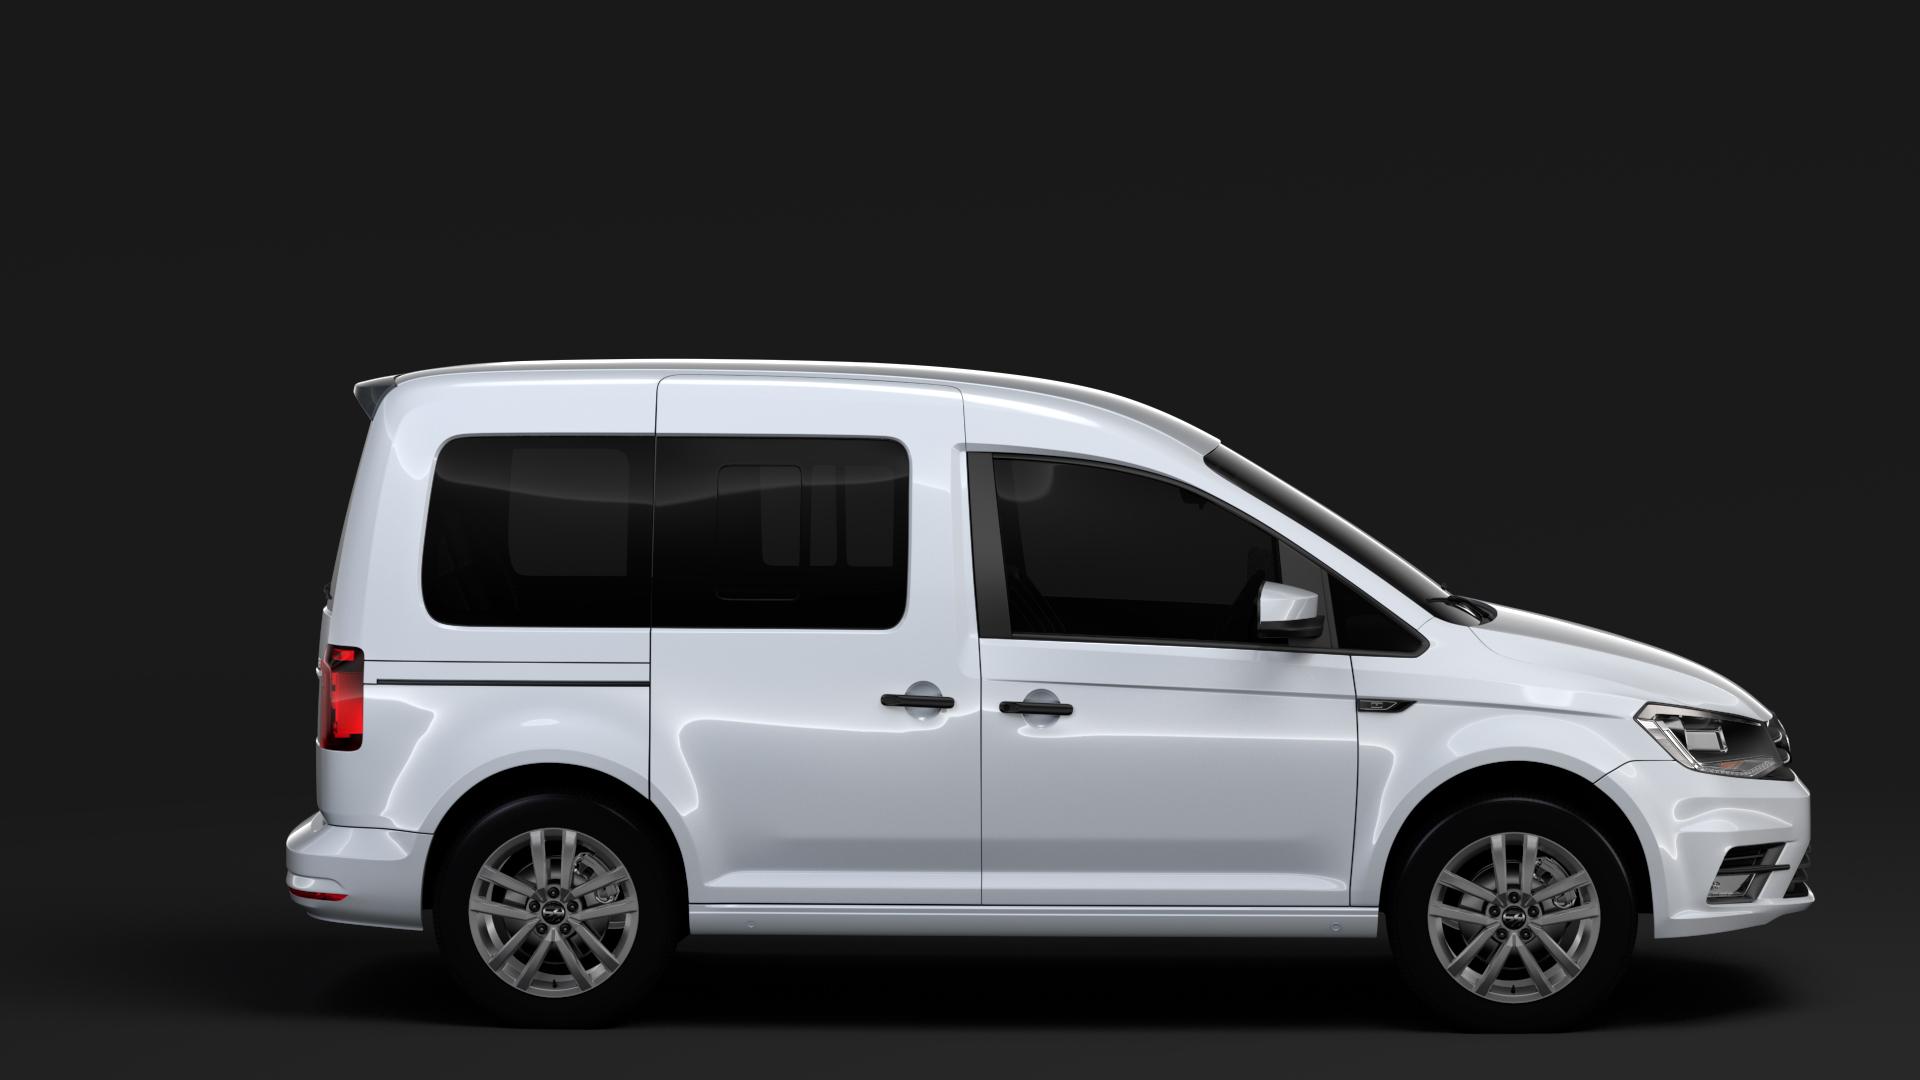 volkswagen caddy 2018 3d model max fbx c4d lwo ma mb hrc xsi obj 283805